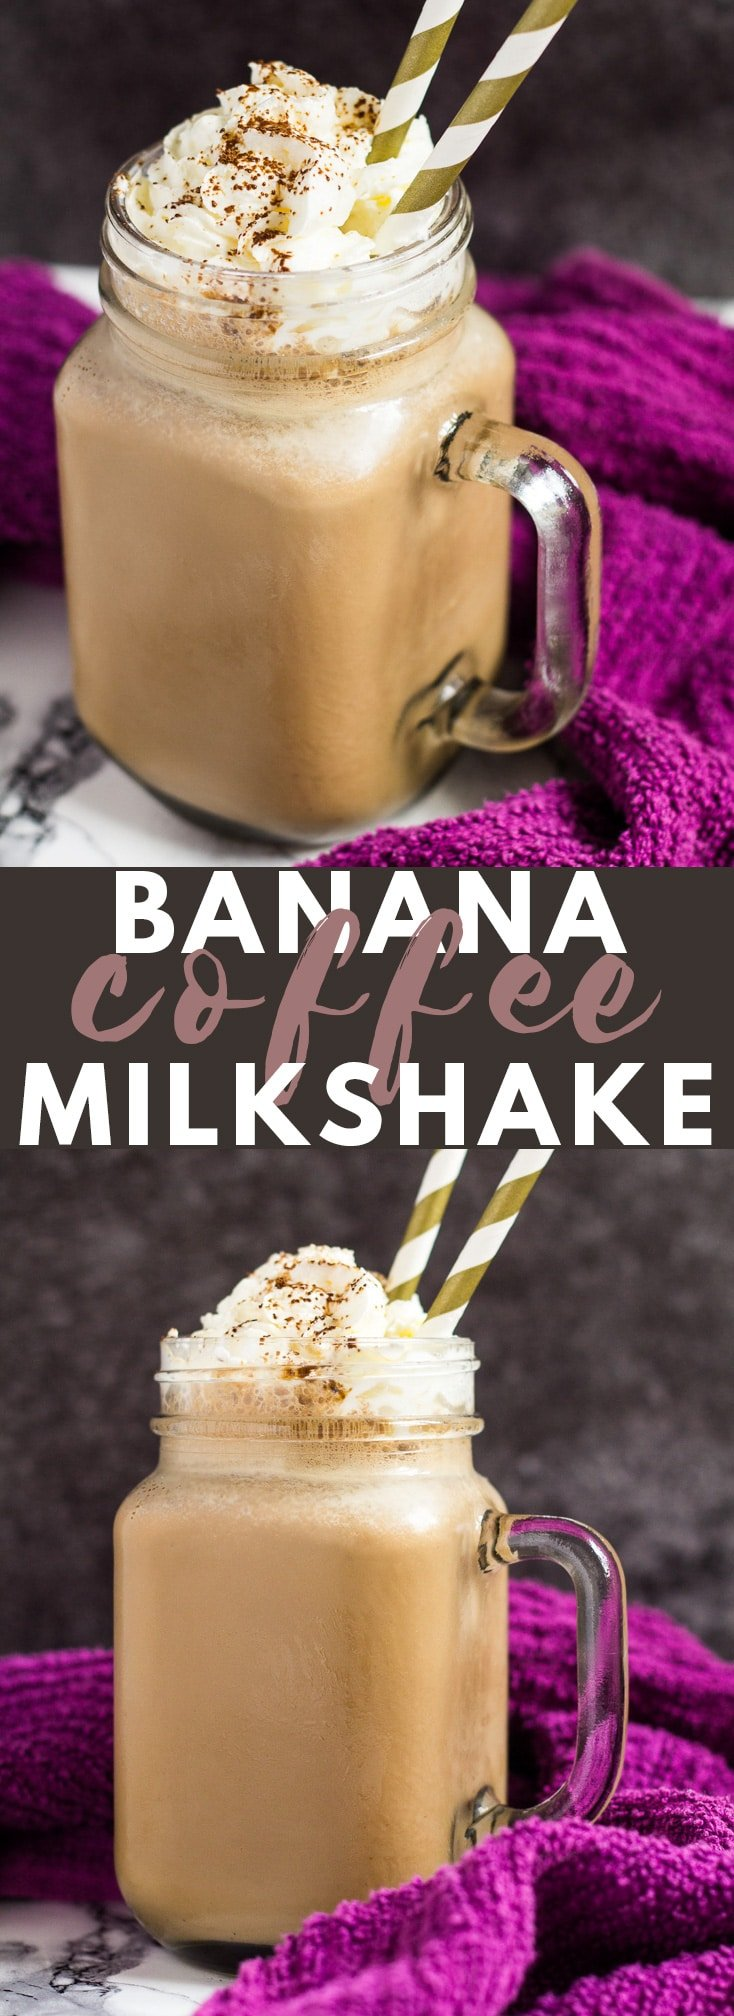 Banana Coffee Milkshake- Wonderfully creamy banana milkshake that is infused with coffee. An indulgent drink for coffee lovers!